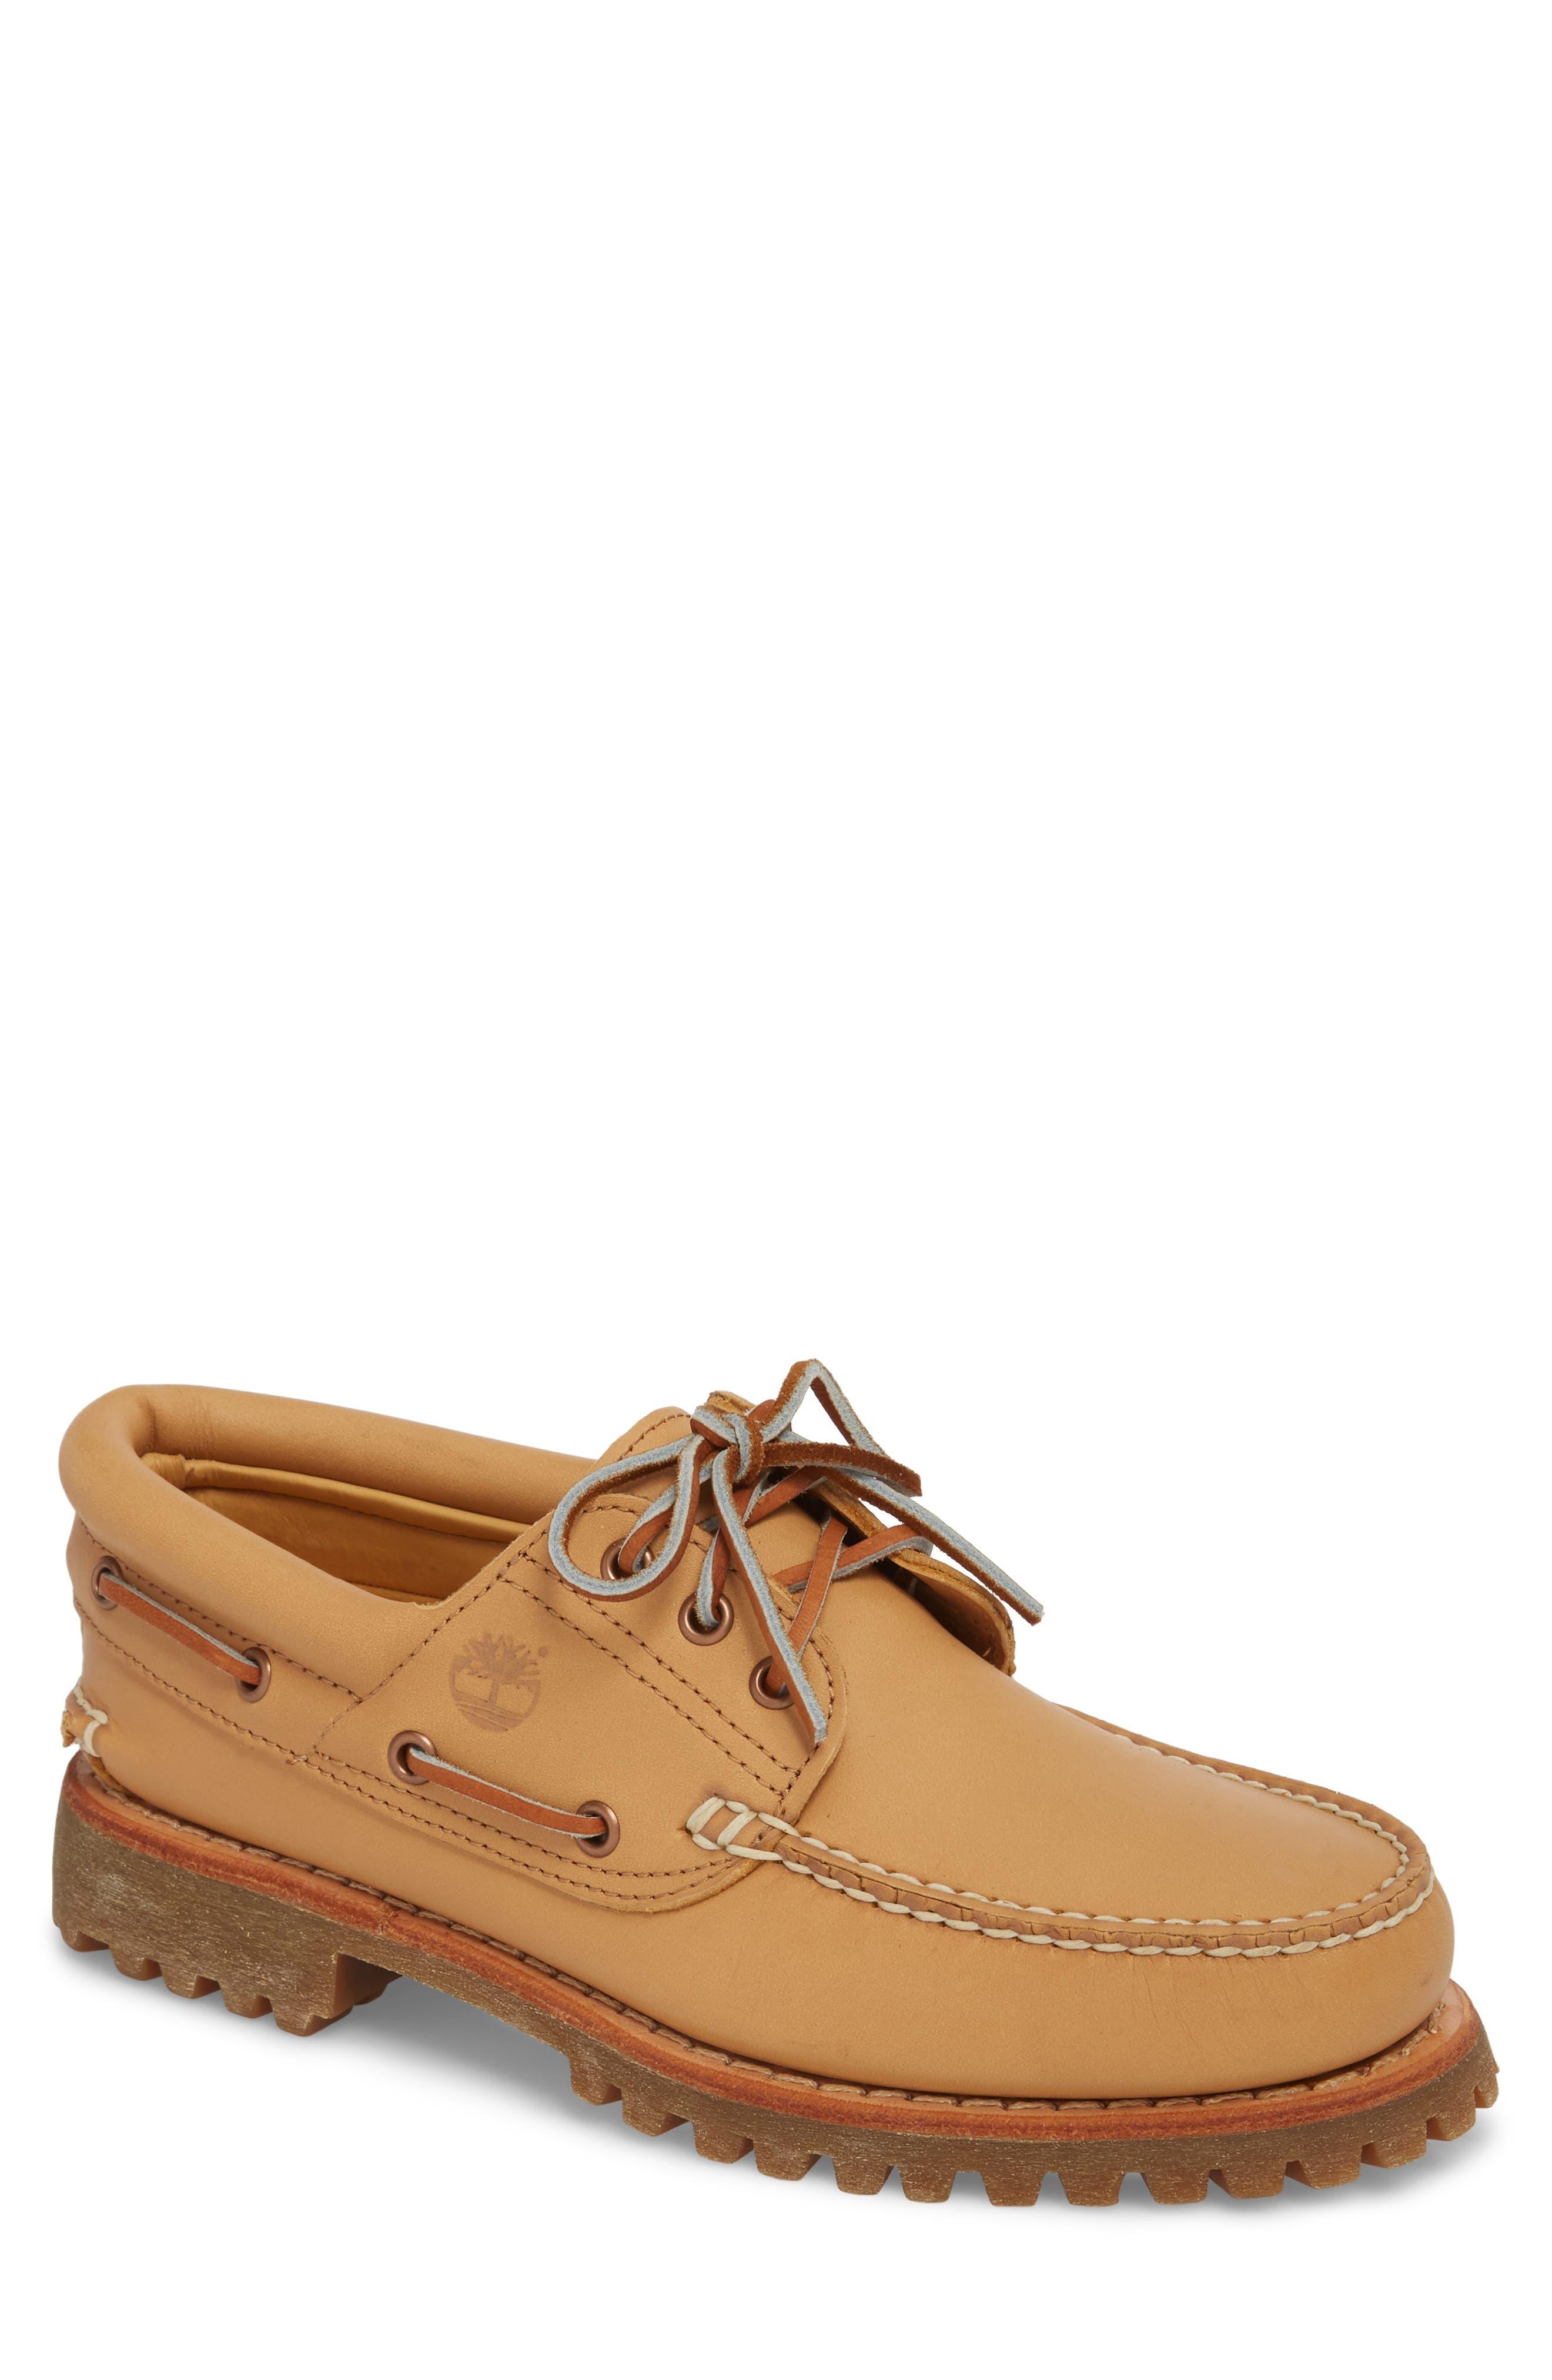 Lug Classic Boat Shoe,                         Main,                         color, Natural Leahter